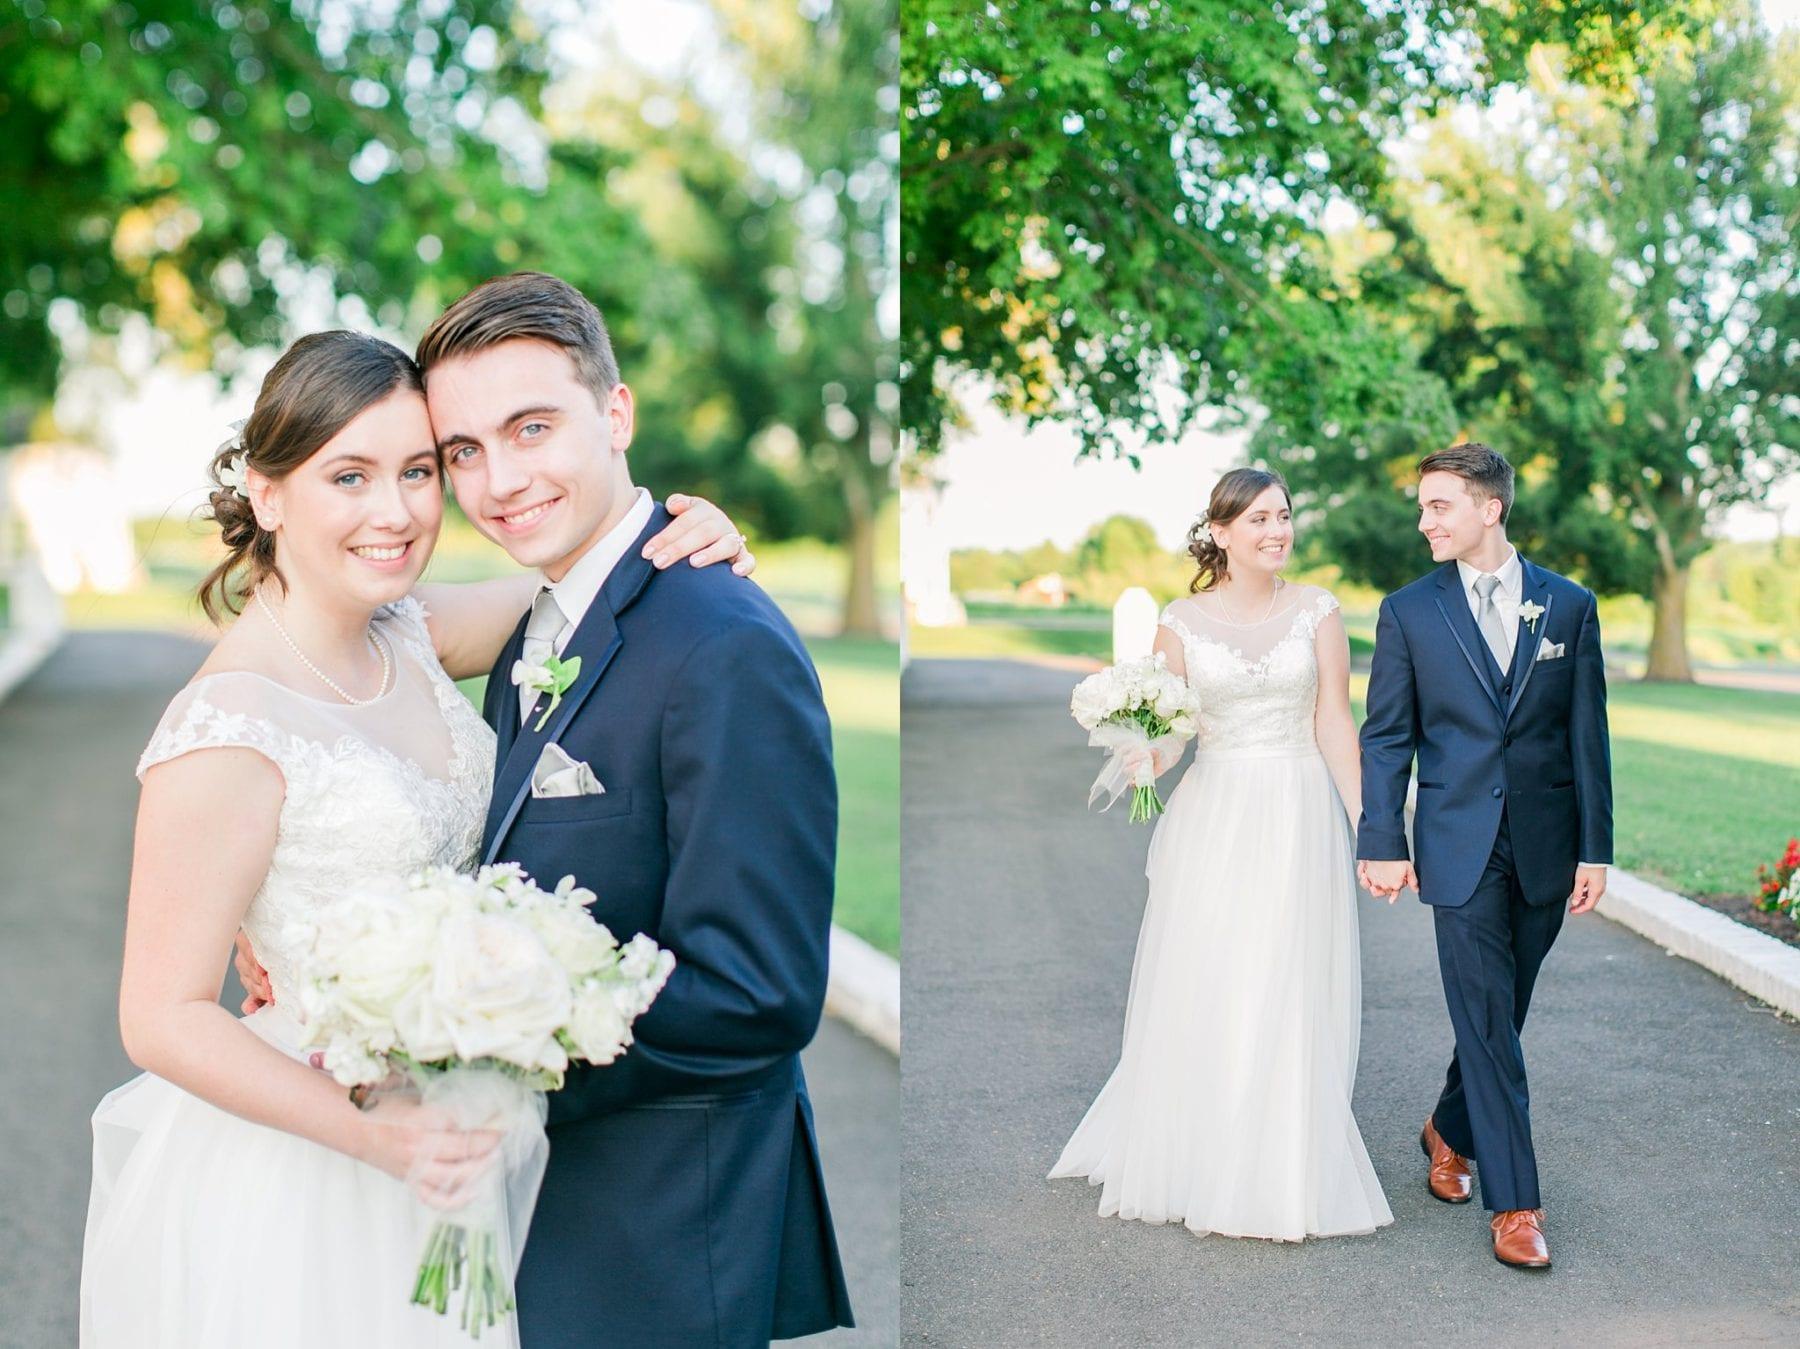 Bristow Manor Wedding Photos Virginia Wedding Photographer Lauren & Andrew Megan Kelsey Photography-539.jpg